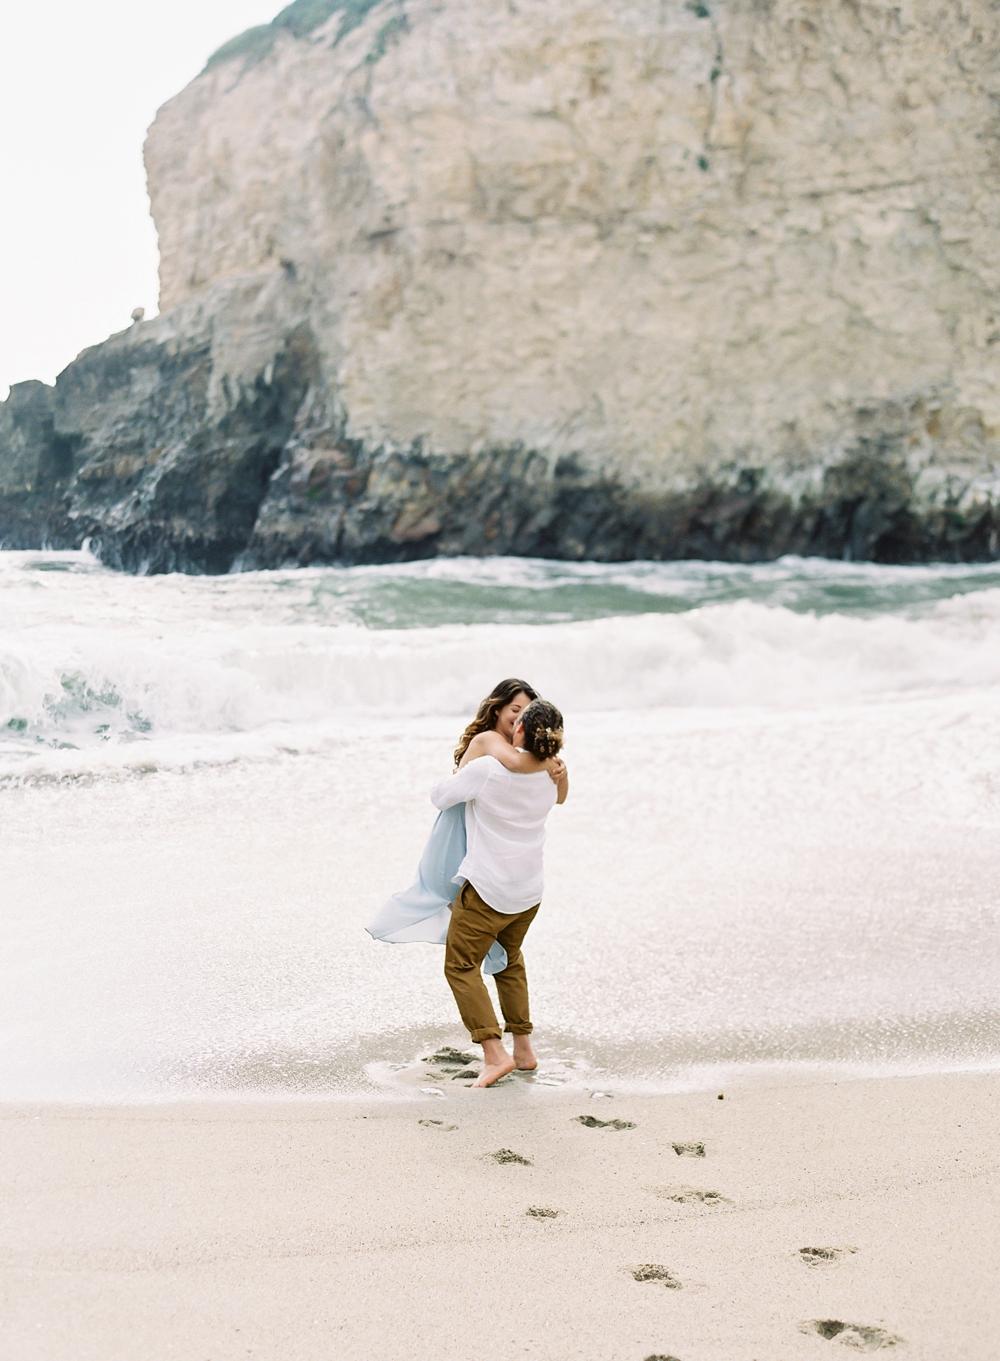 fine art film destination wedding photographer, washington DC, maryland, virginia, santa cruz, california